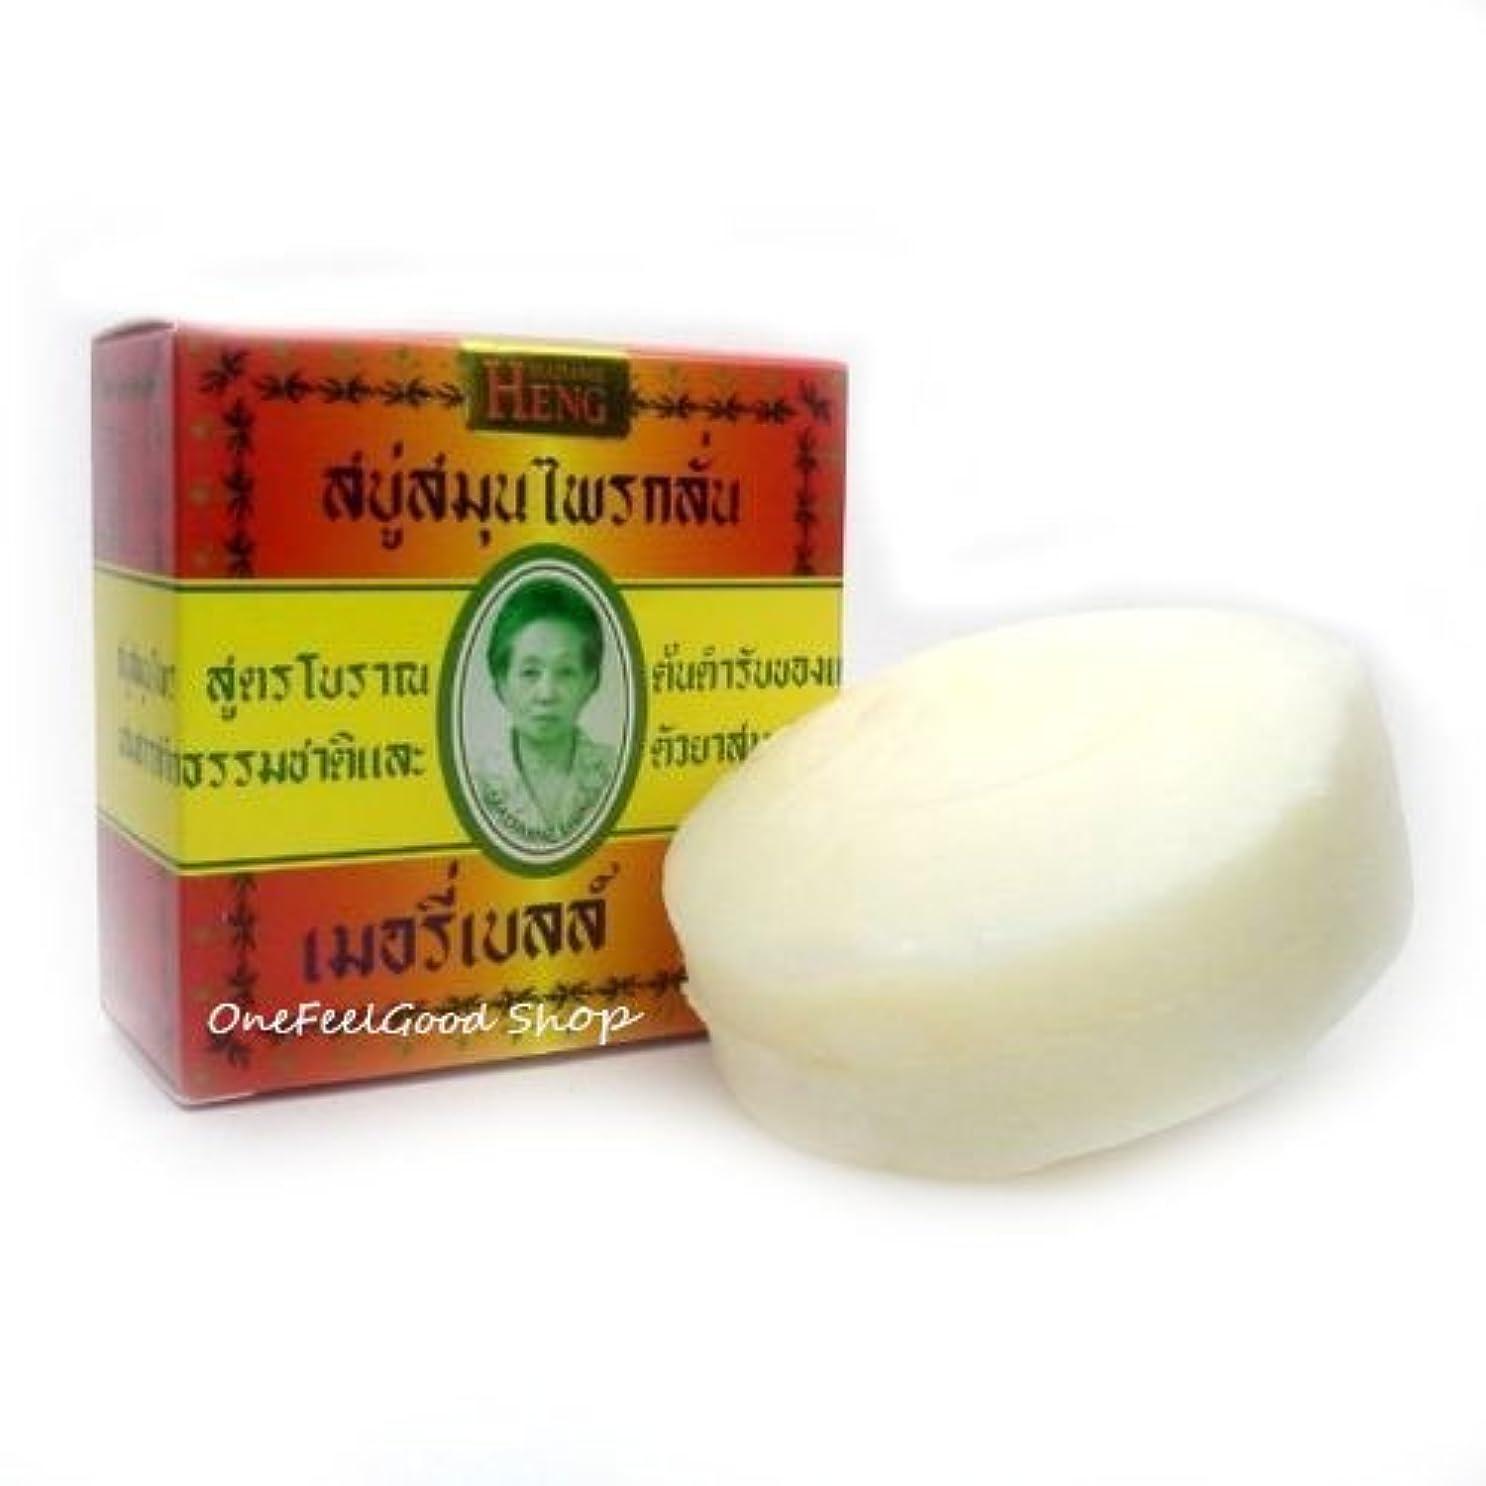 2 of MADAME HENG NATURAL SOAP BAR MERRY BELL ORIGINAL THAI (net wt 5.64 OZ.or 160g. / bar.) PACK OF 2 BAR. by...